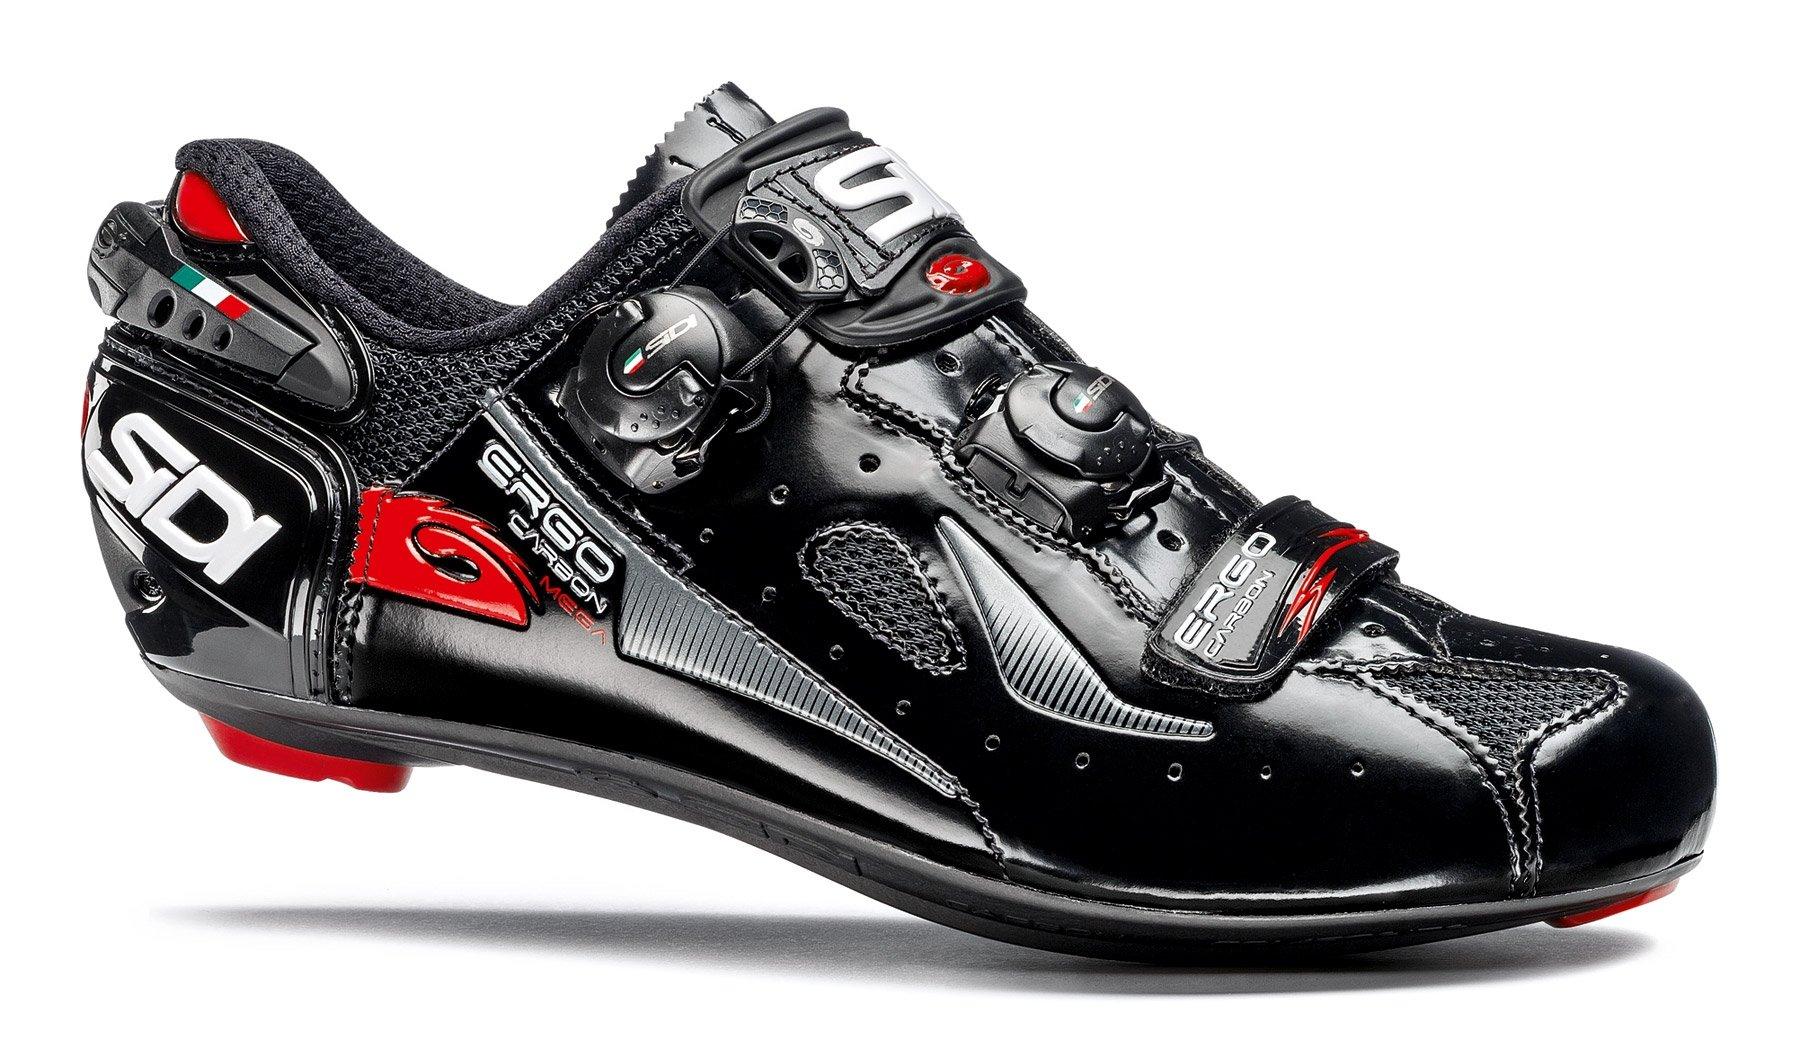 Sidi Ergo 4 Mega Carbon Road Cycling Shoes - Black/Black (41 EU)